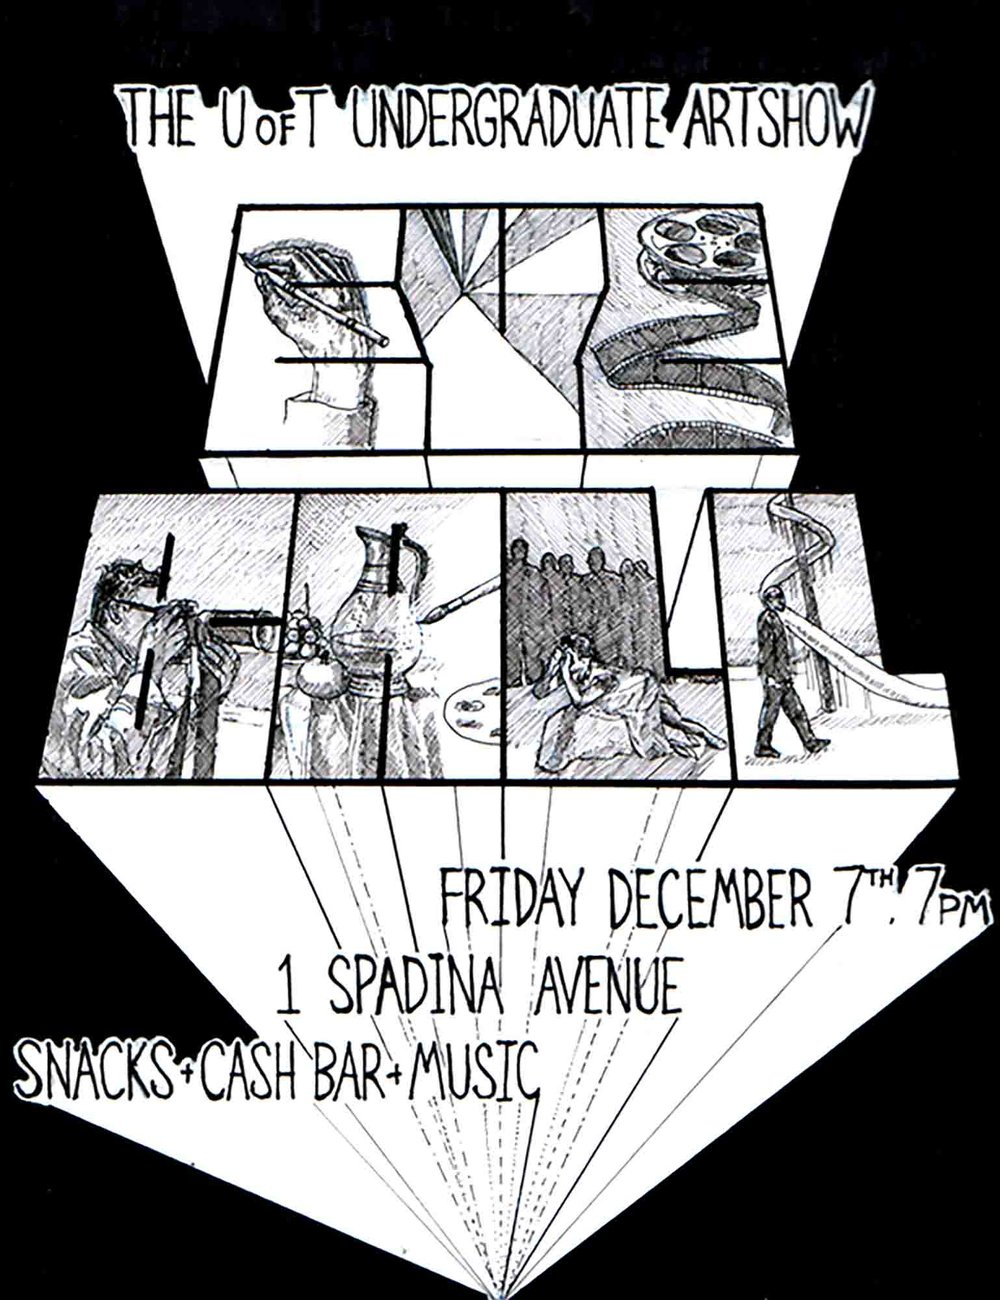 The 2007 Eyeball Artshow - alternate poster